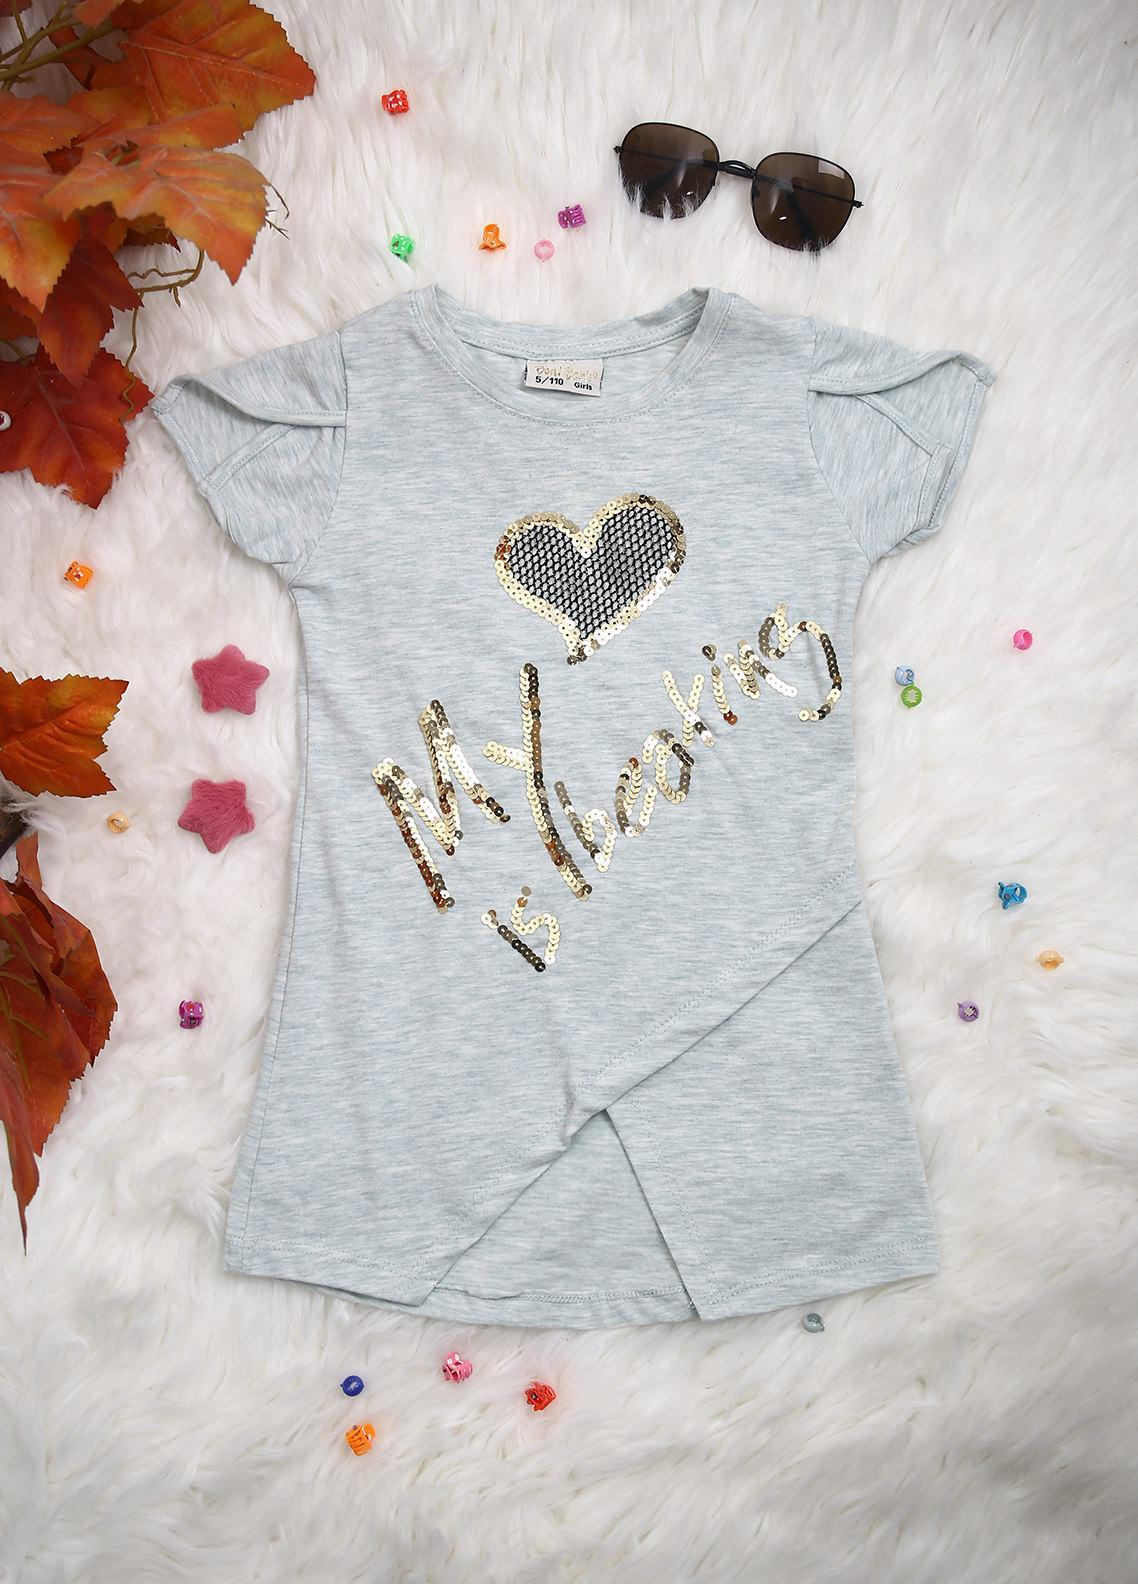 Sanaulla Exclusive Range Cotton Casual T-Shirts for Girls -  D-2244 Pista